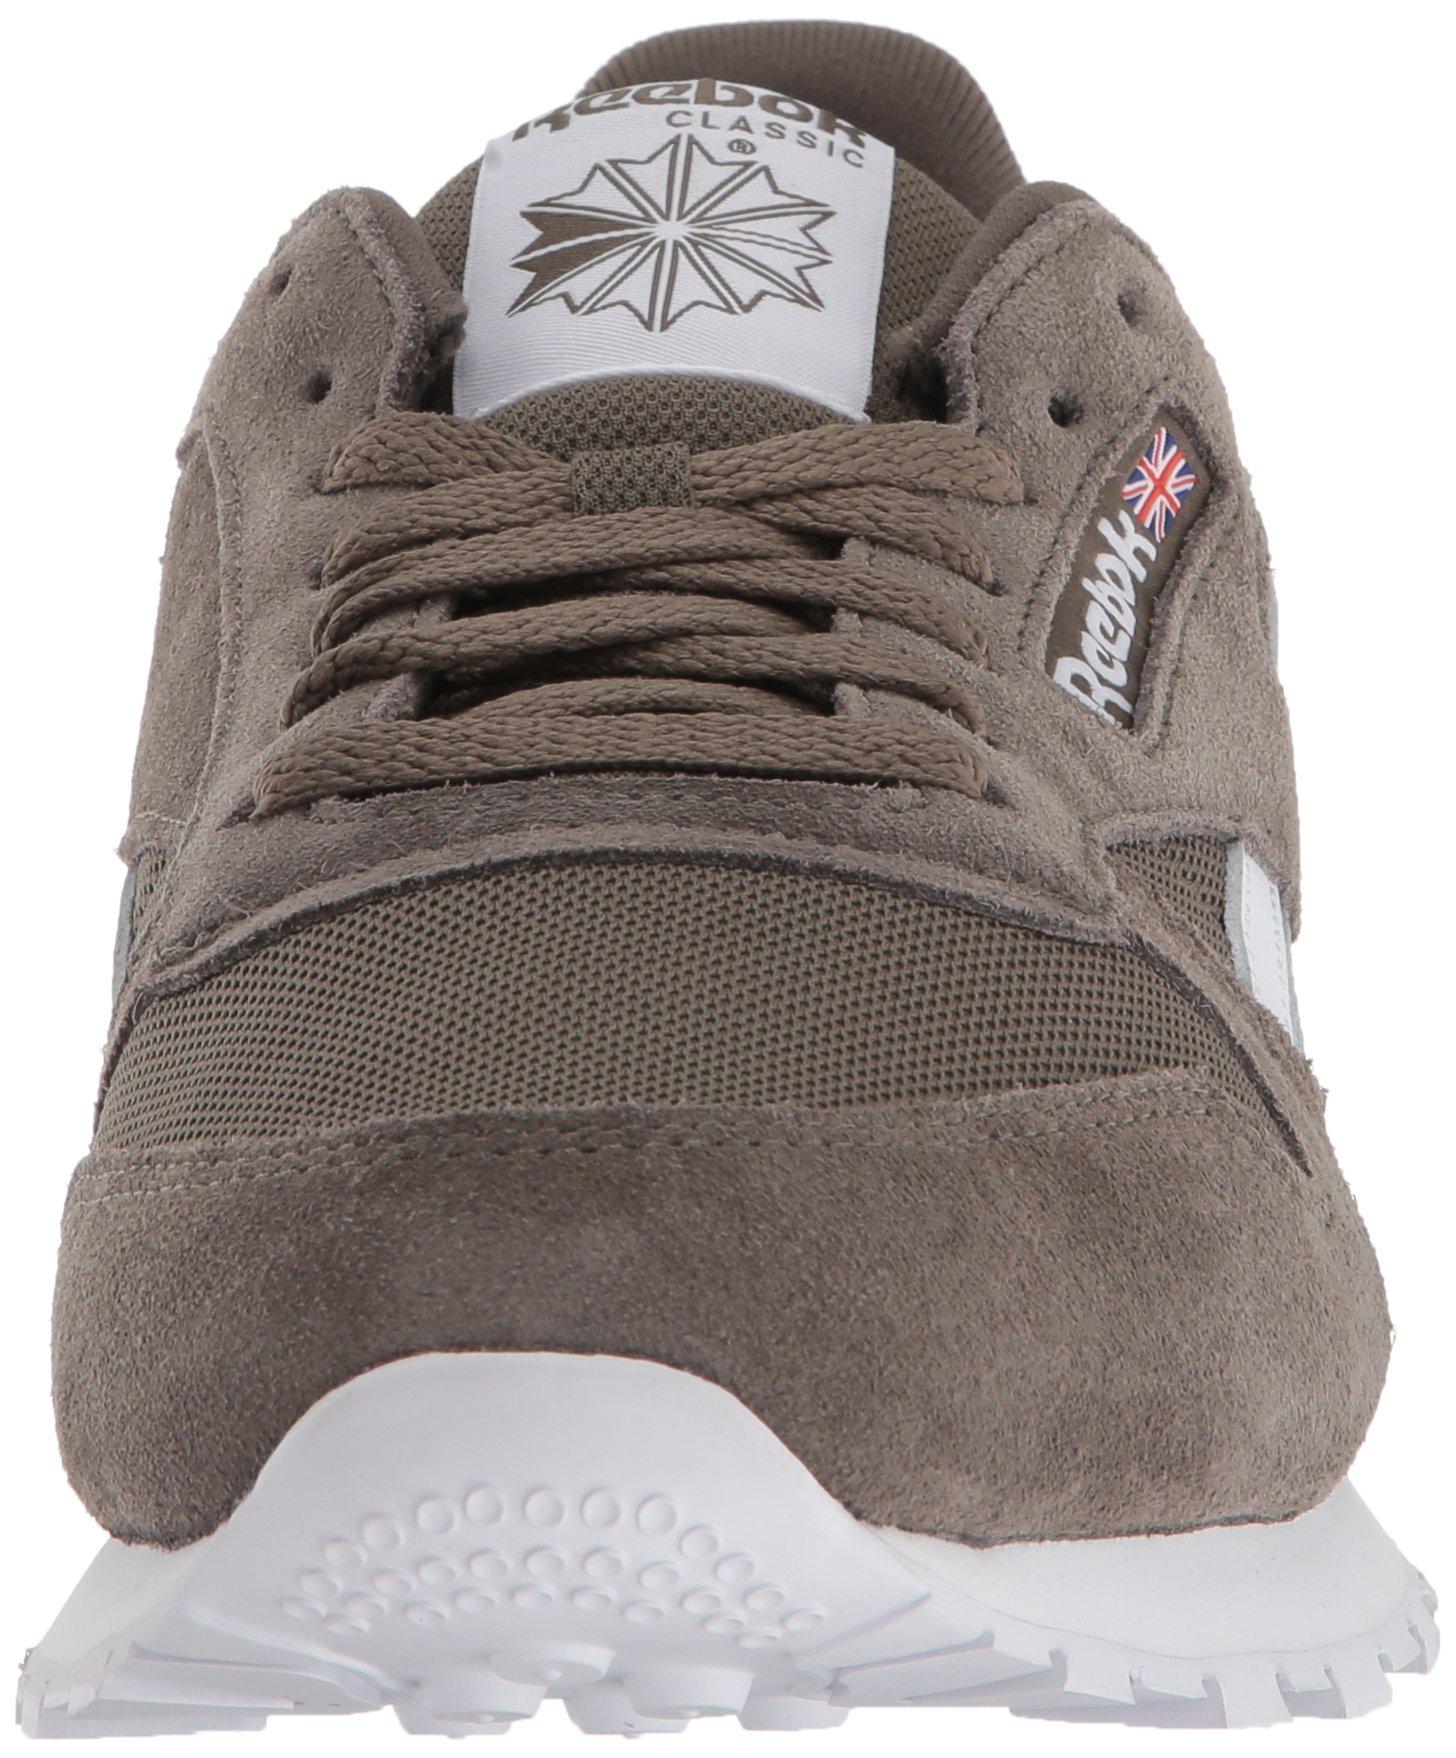 Reebok Men's Classic Leather Walking Shoe, Estl-Terrain Grey/White, 9 M US